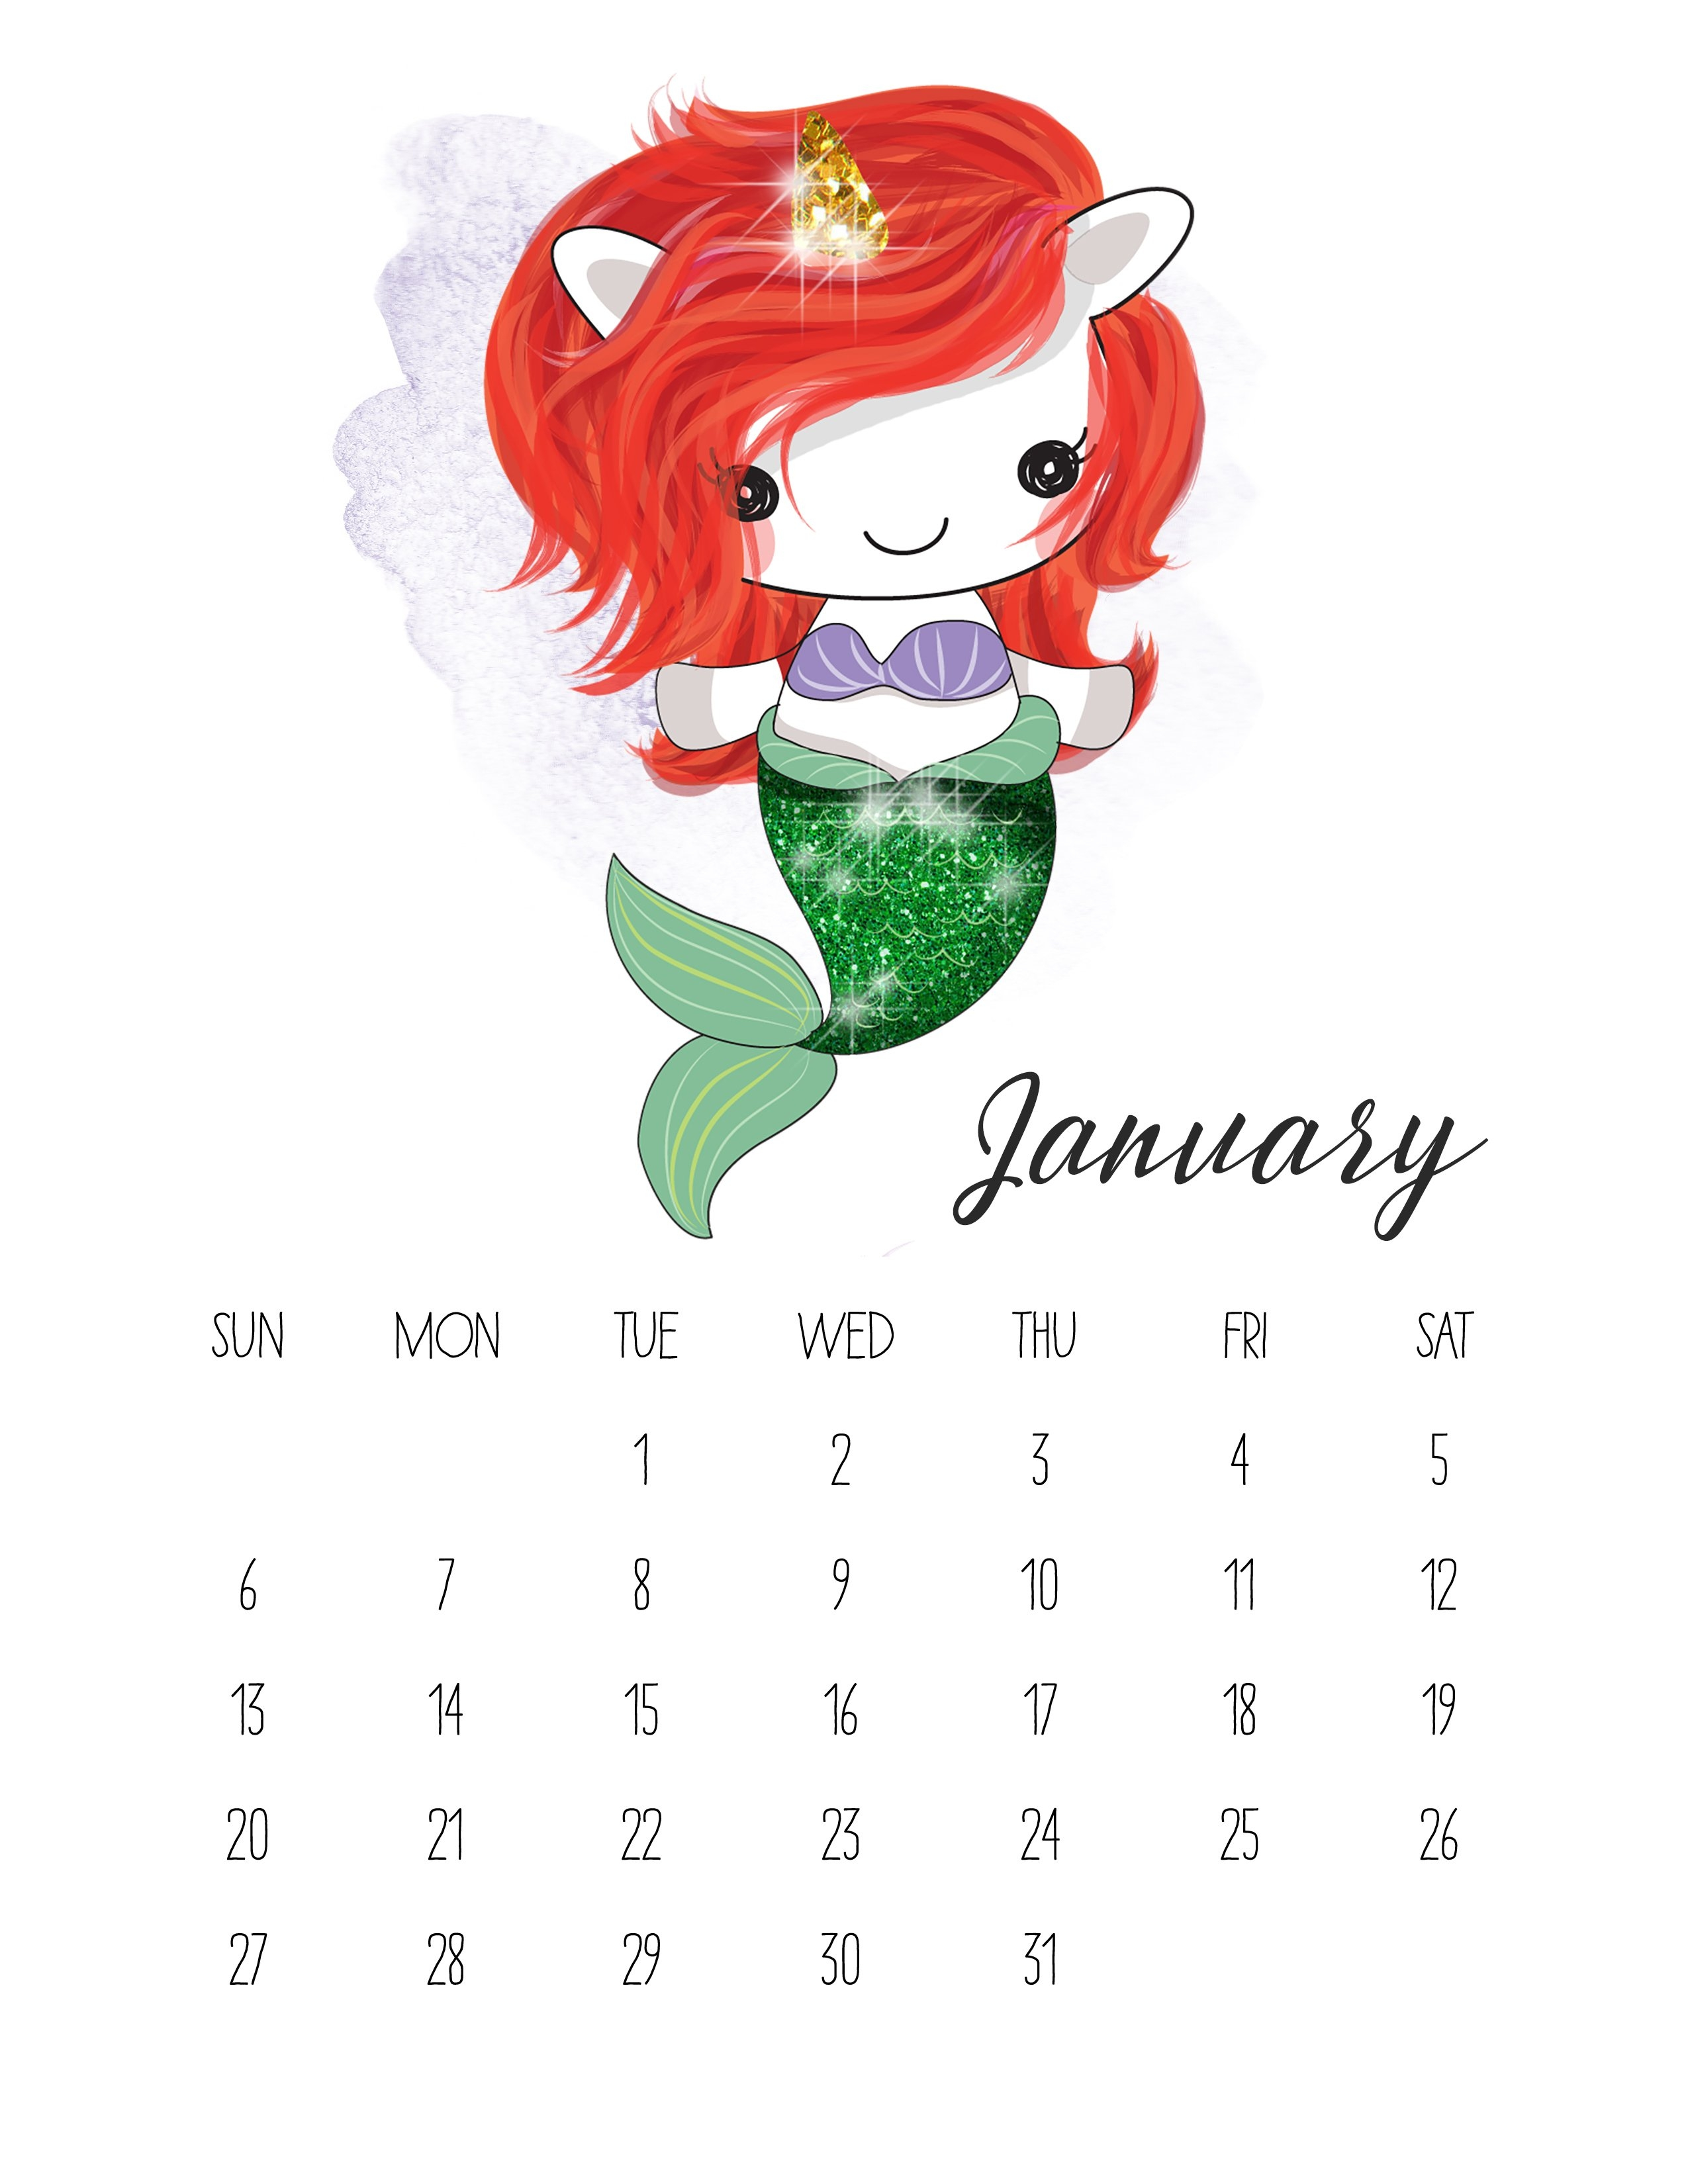 Free Printable 2019 Pop Culture Unicorn Calendar - The Cottage Market Calendar 2019 Unicorn